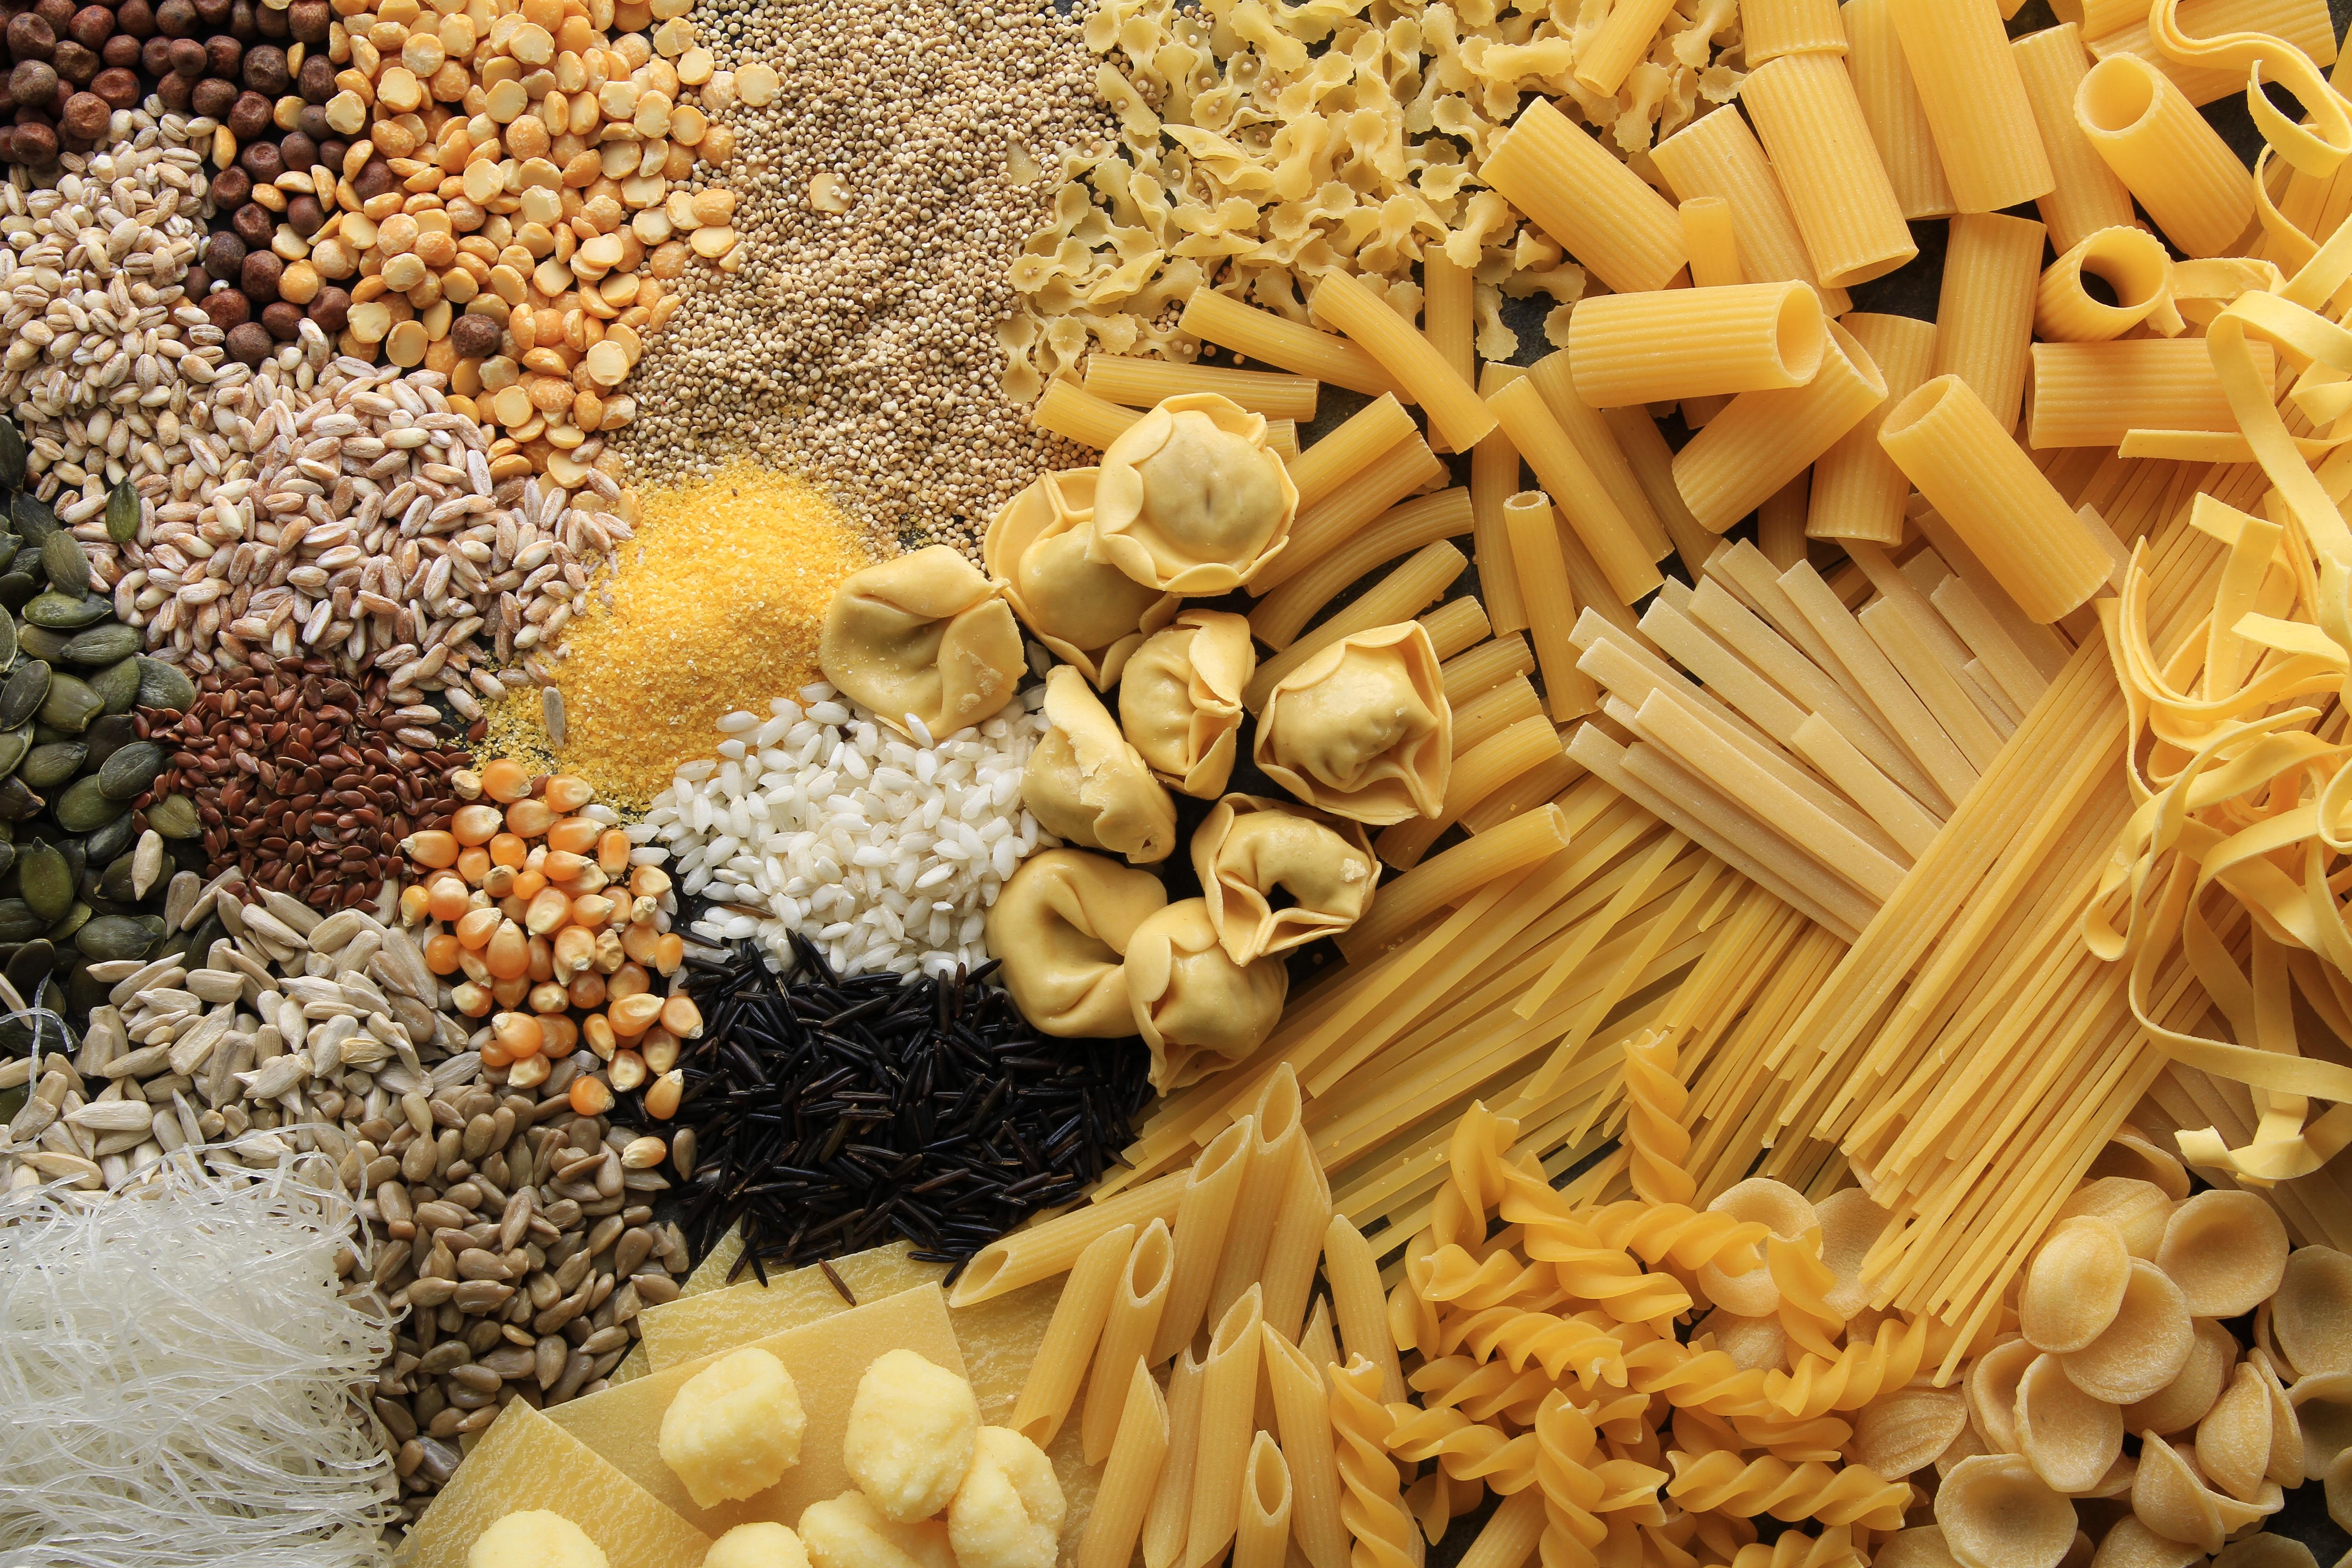 food - grain, pasta, rice